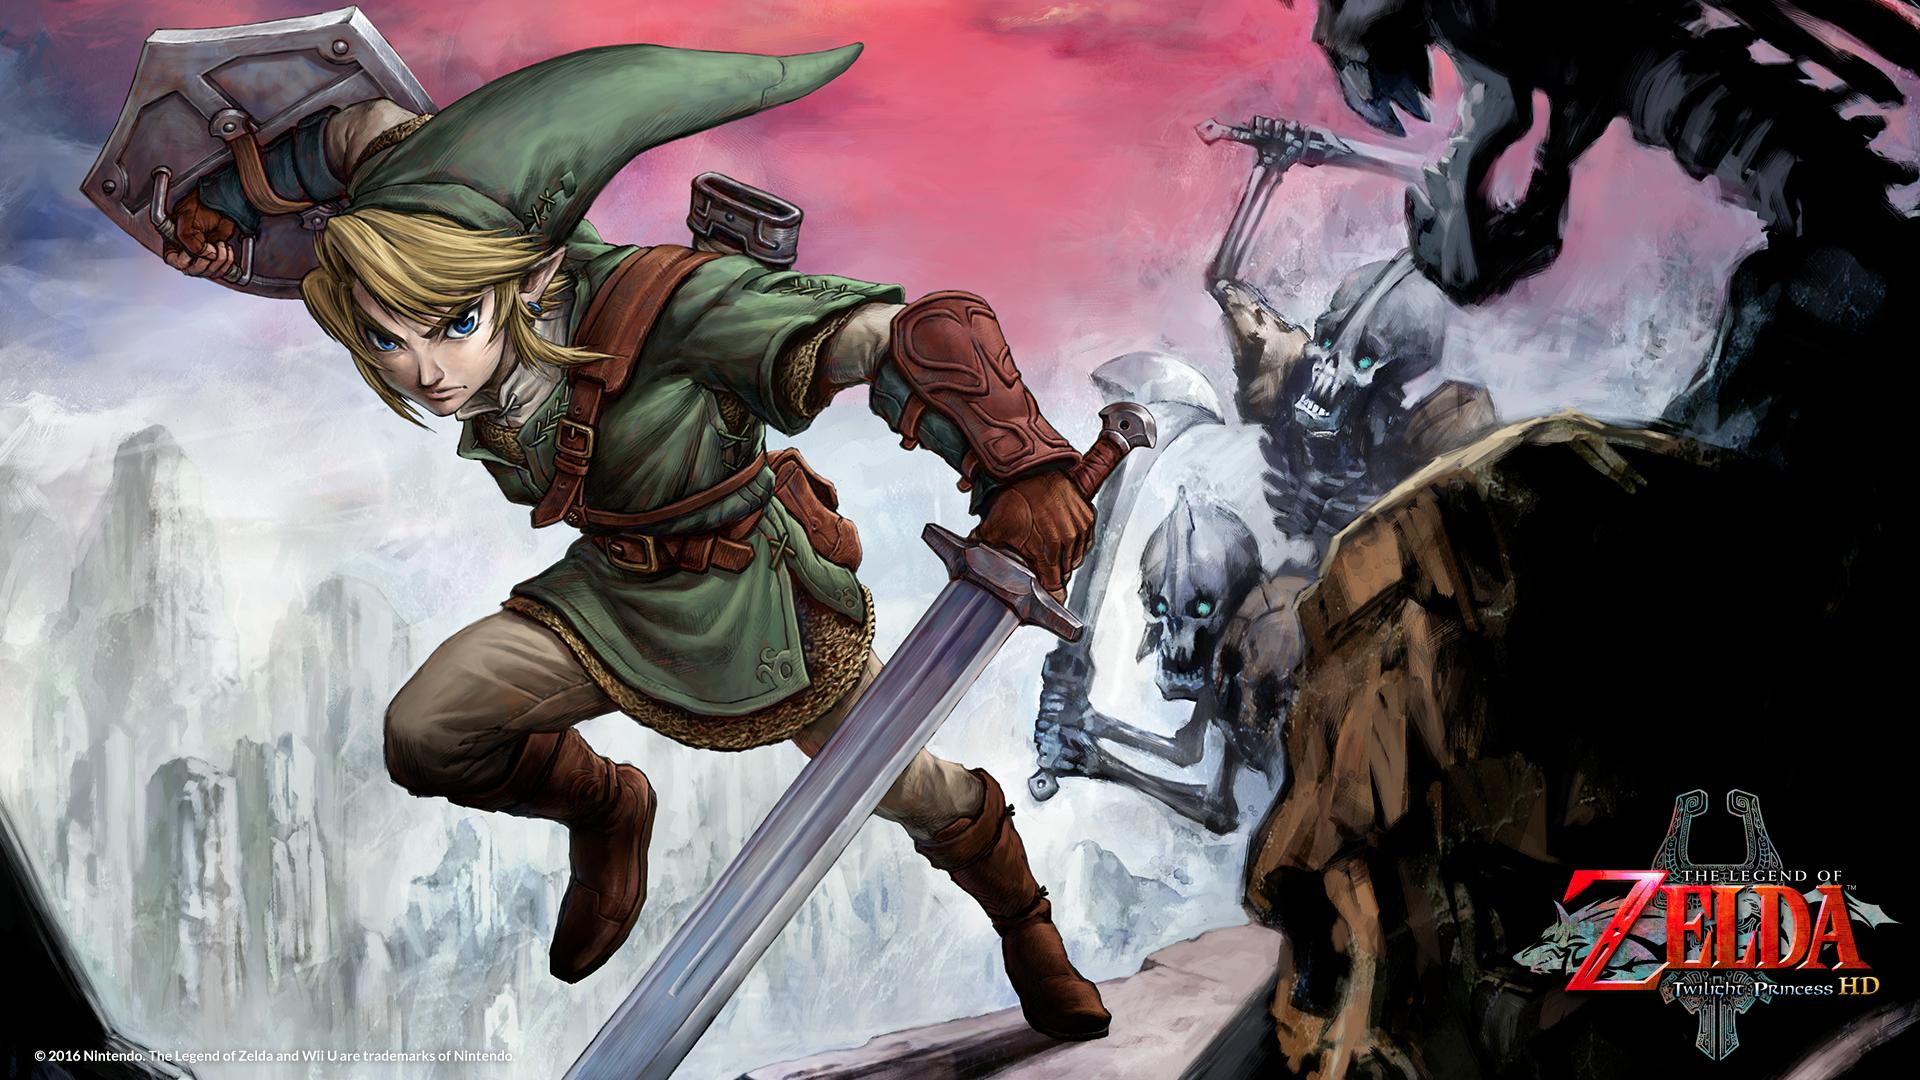 Abierta La Web Oficial De The Legend Of Zelda Twilight